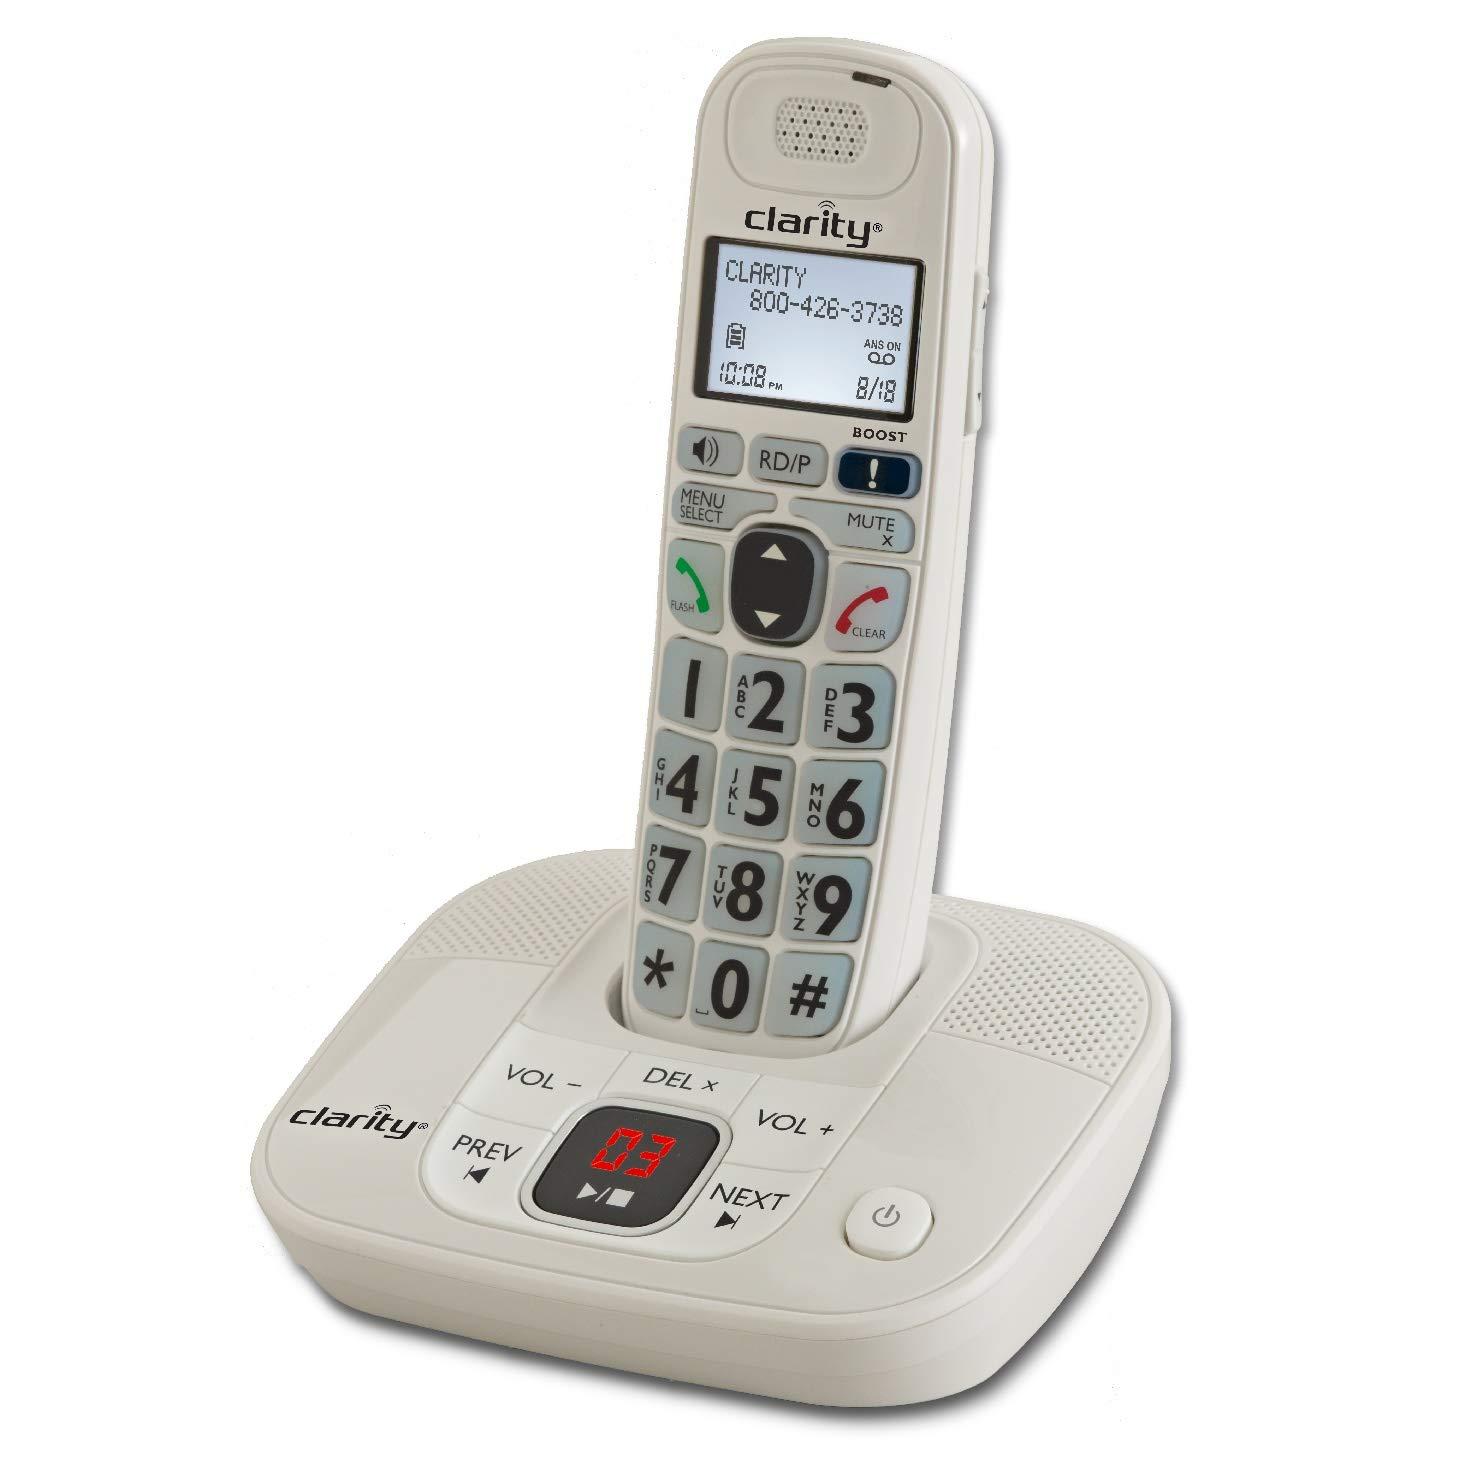 Plantronics D714 W/ Answering Machine Plantronics Canada 53714 Phone Systems